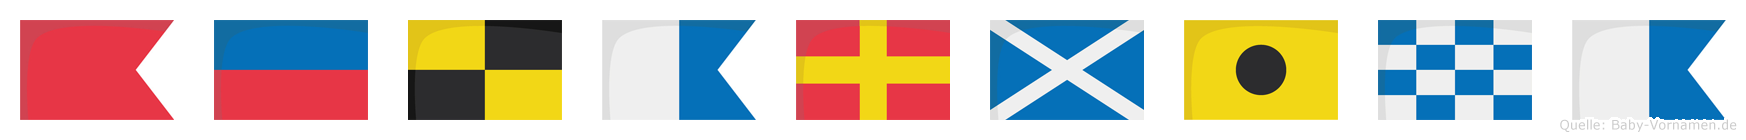 Belarmina im Flaggenalphabet